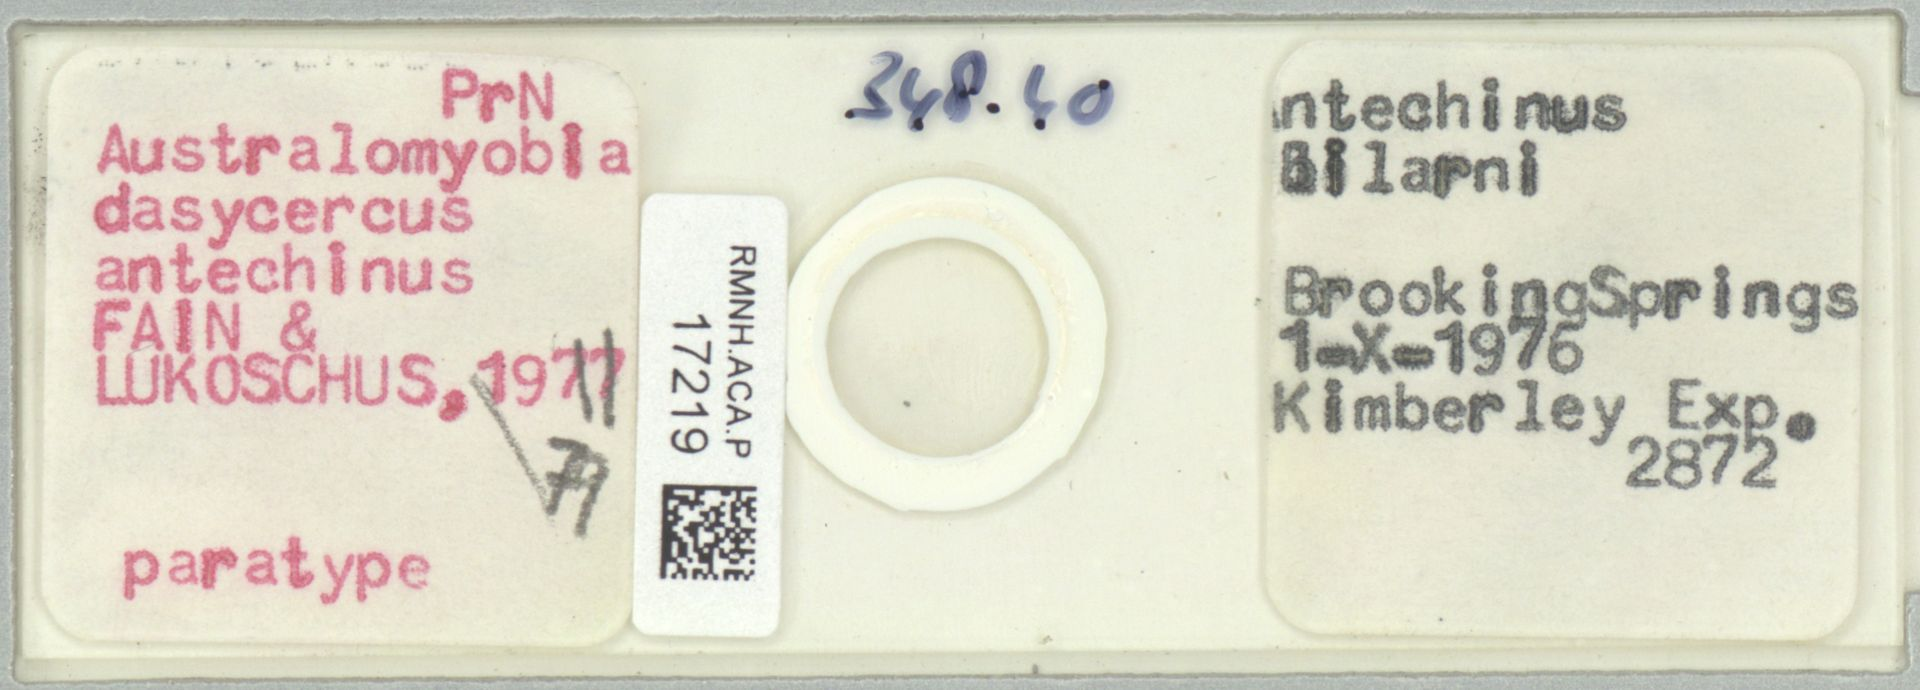 RMNH.ACA.P.17219   Australomyobia dasycercus antechinus